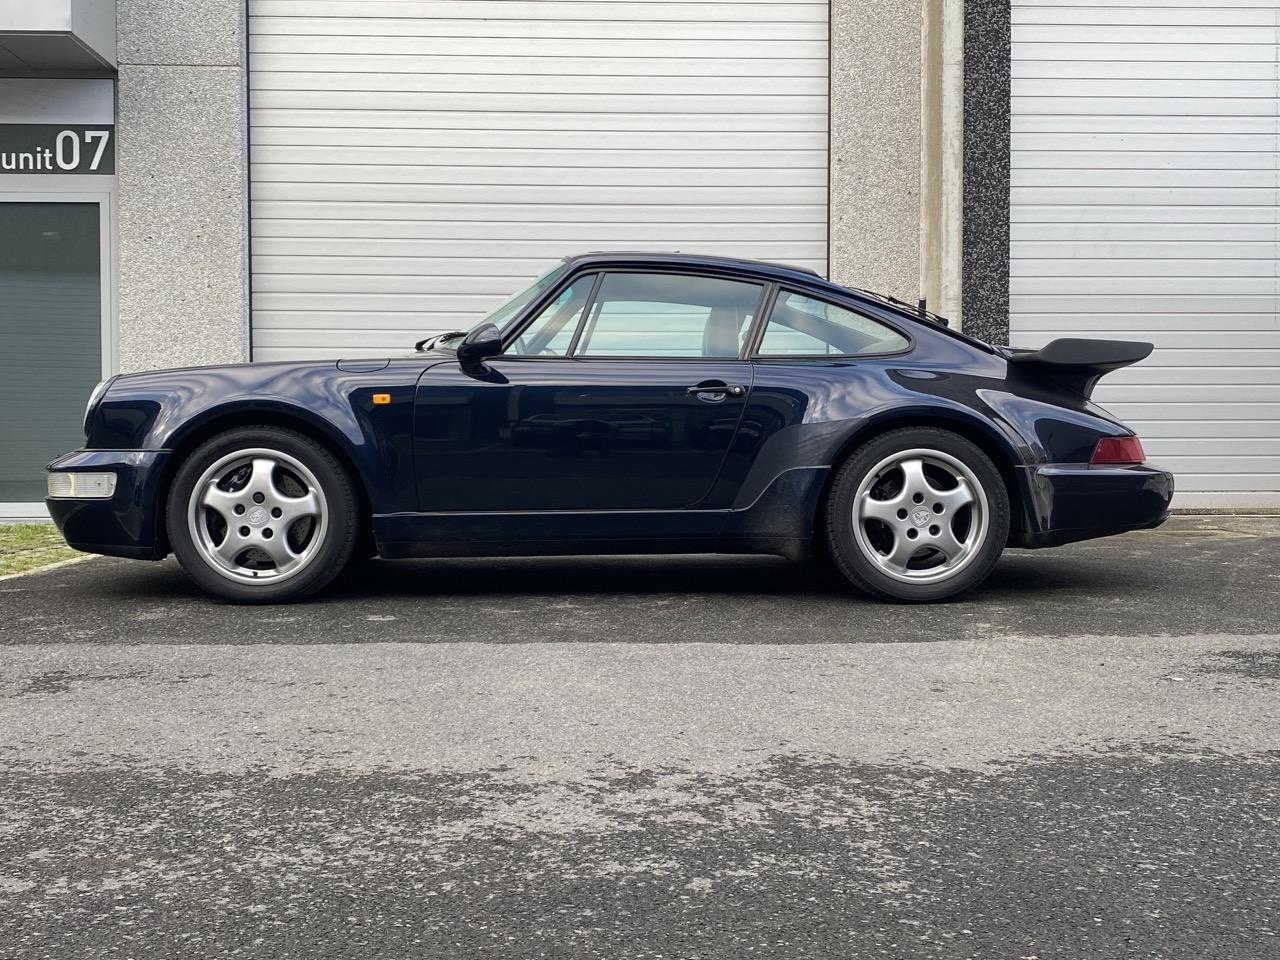 youngtimer.one - Porsche 964 turbo - Nachtblau - 1991 - 2 of 3